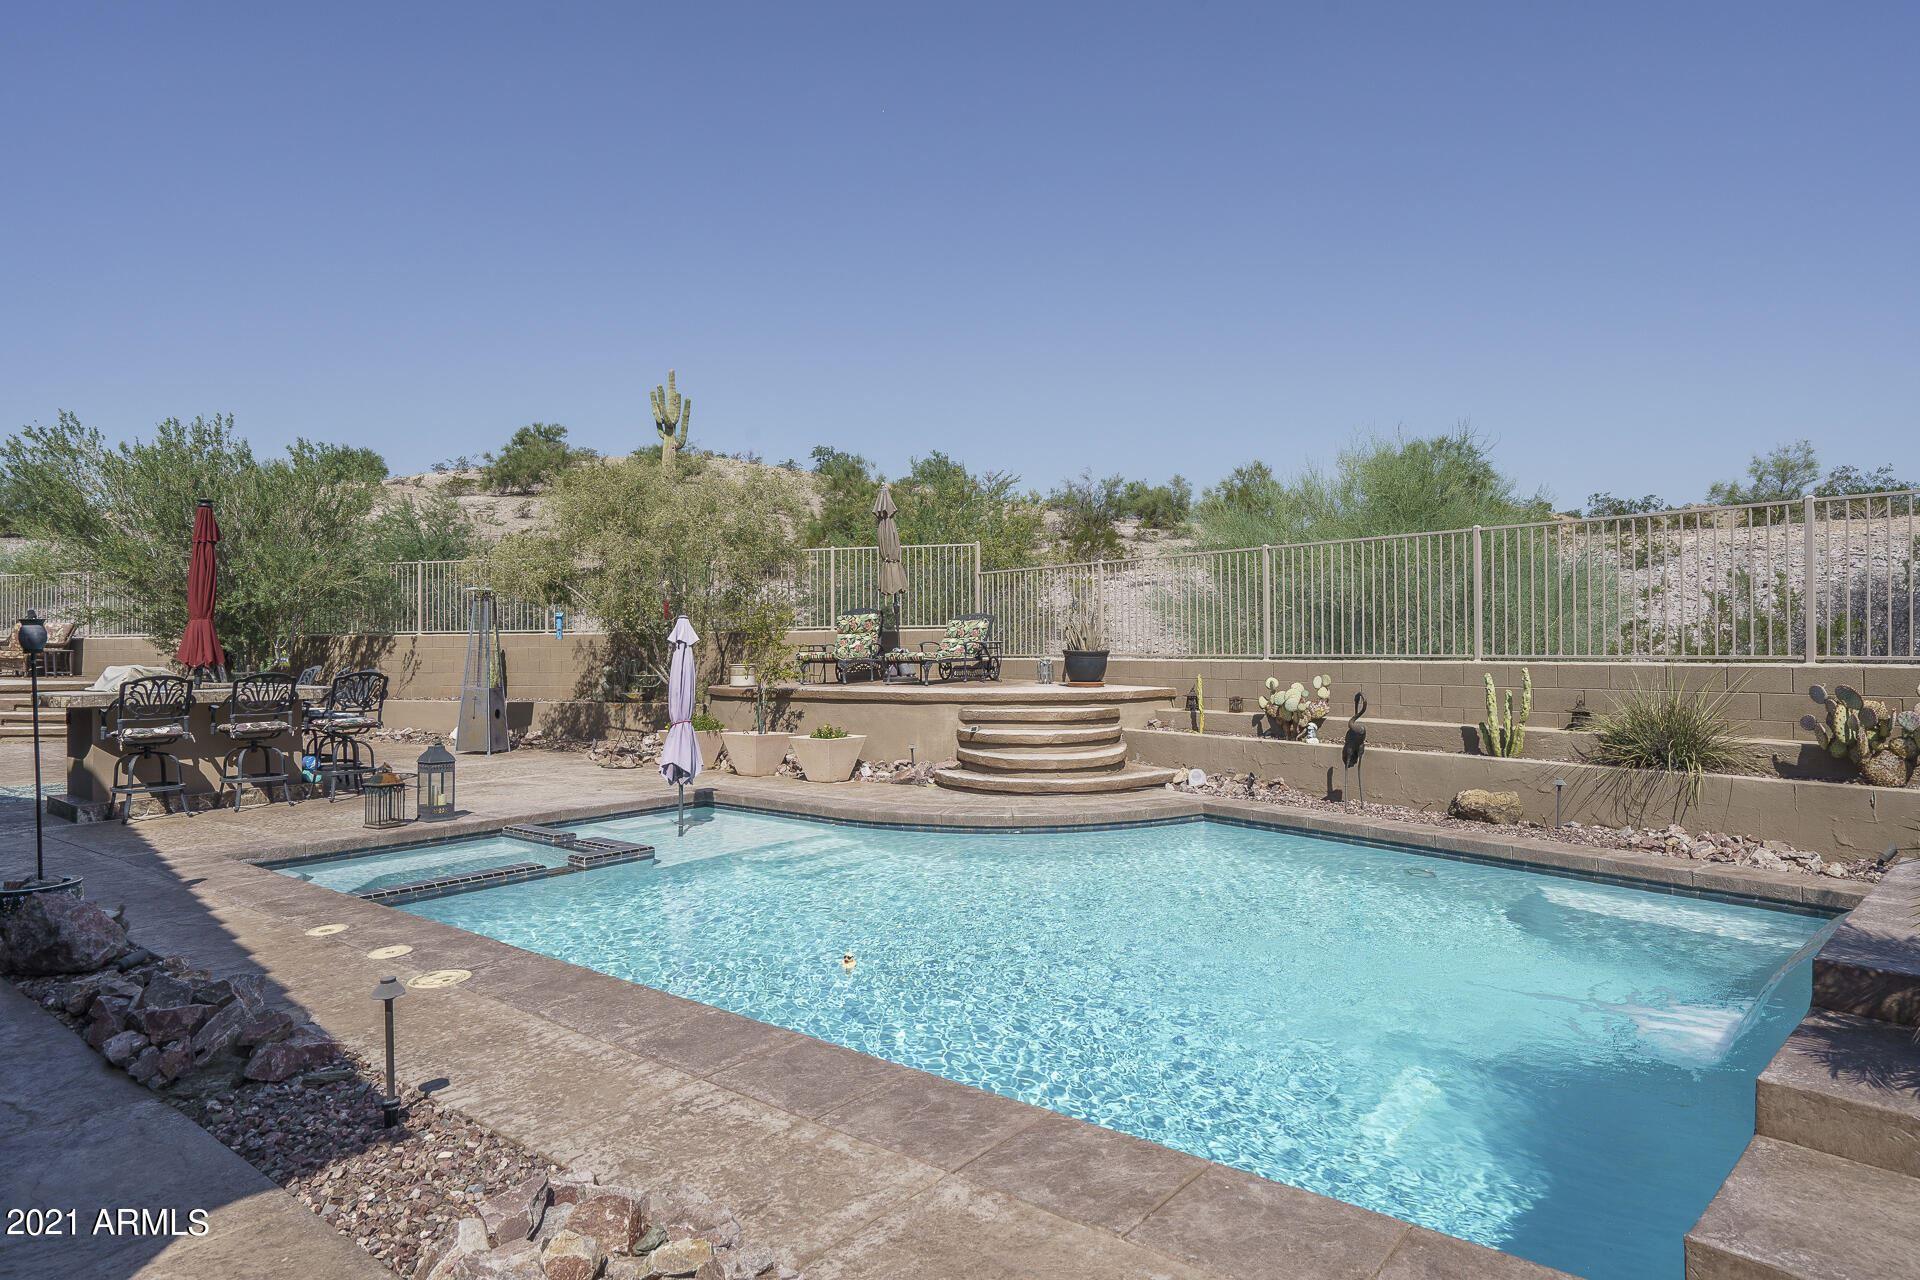 Photo of 18674 W MCNEIL Street, Goodyear, AZ 85338 (MLS # 6296428)